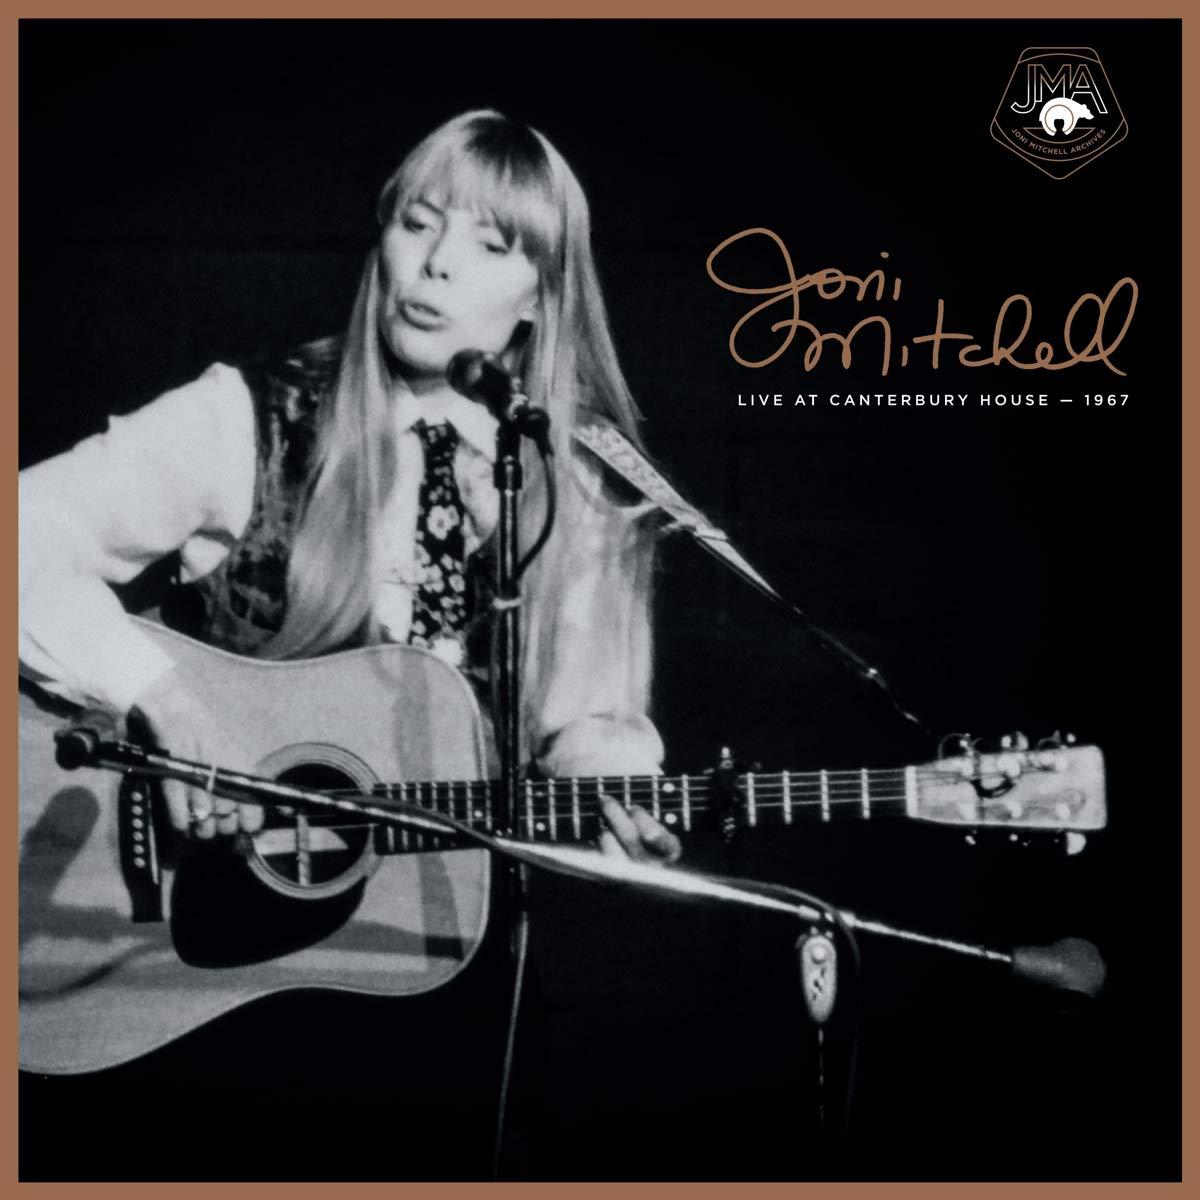 Joni Mitchell - Live At Canterbury House 1967 [LTD 3xLP]